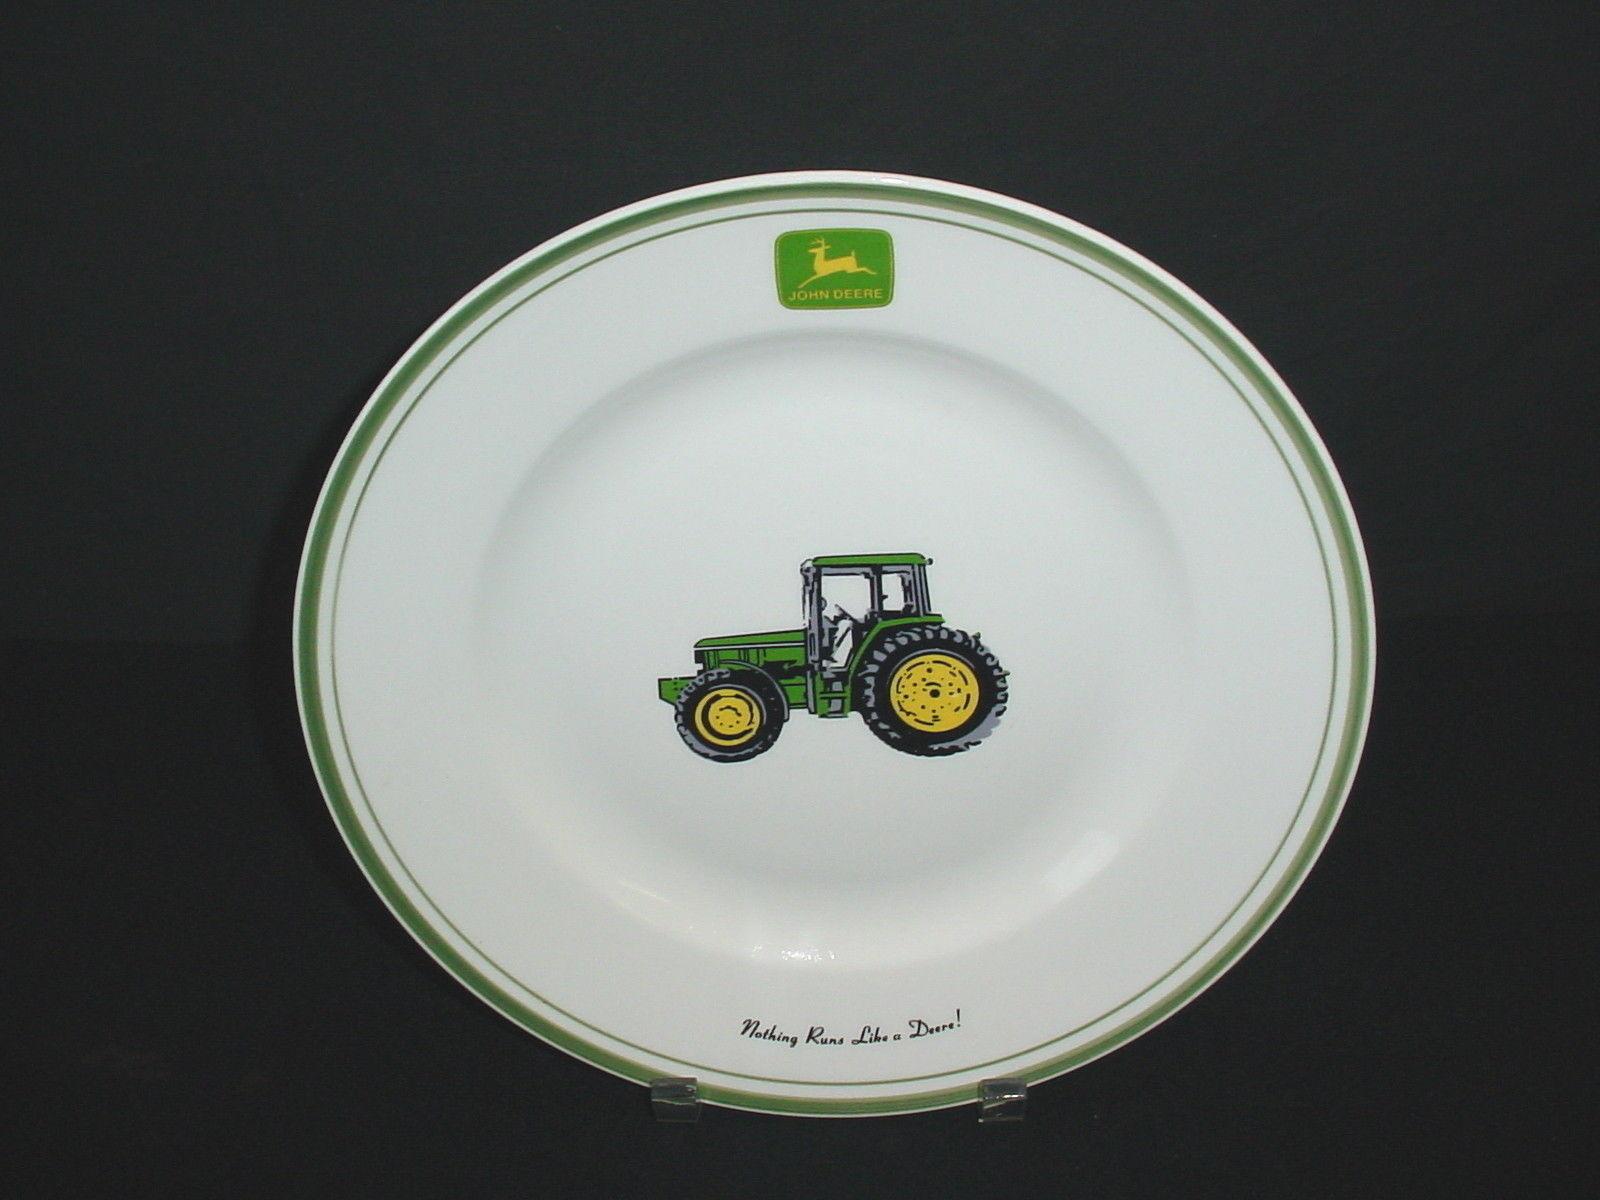 John Deere Tractor Plates : John deere tractor nothing runs like a gibson dinner